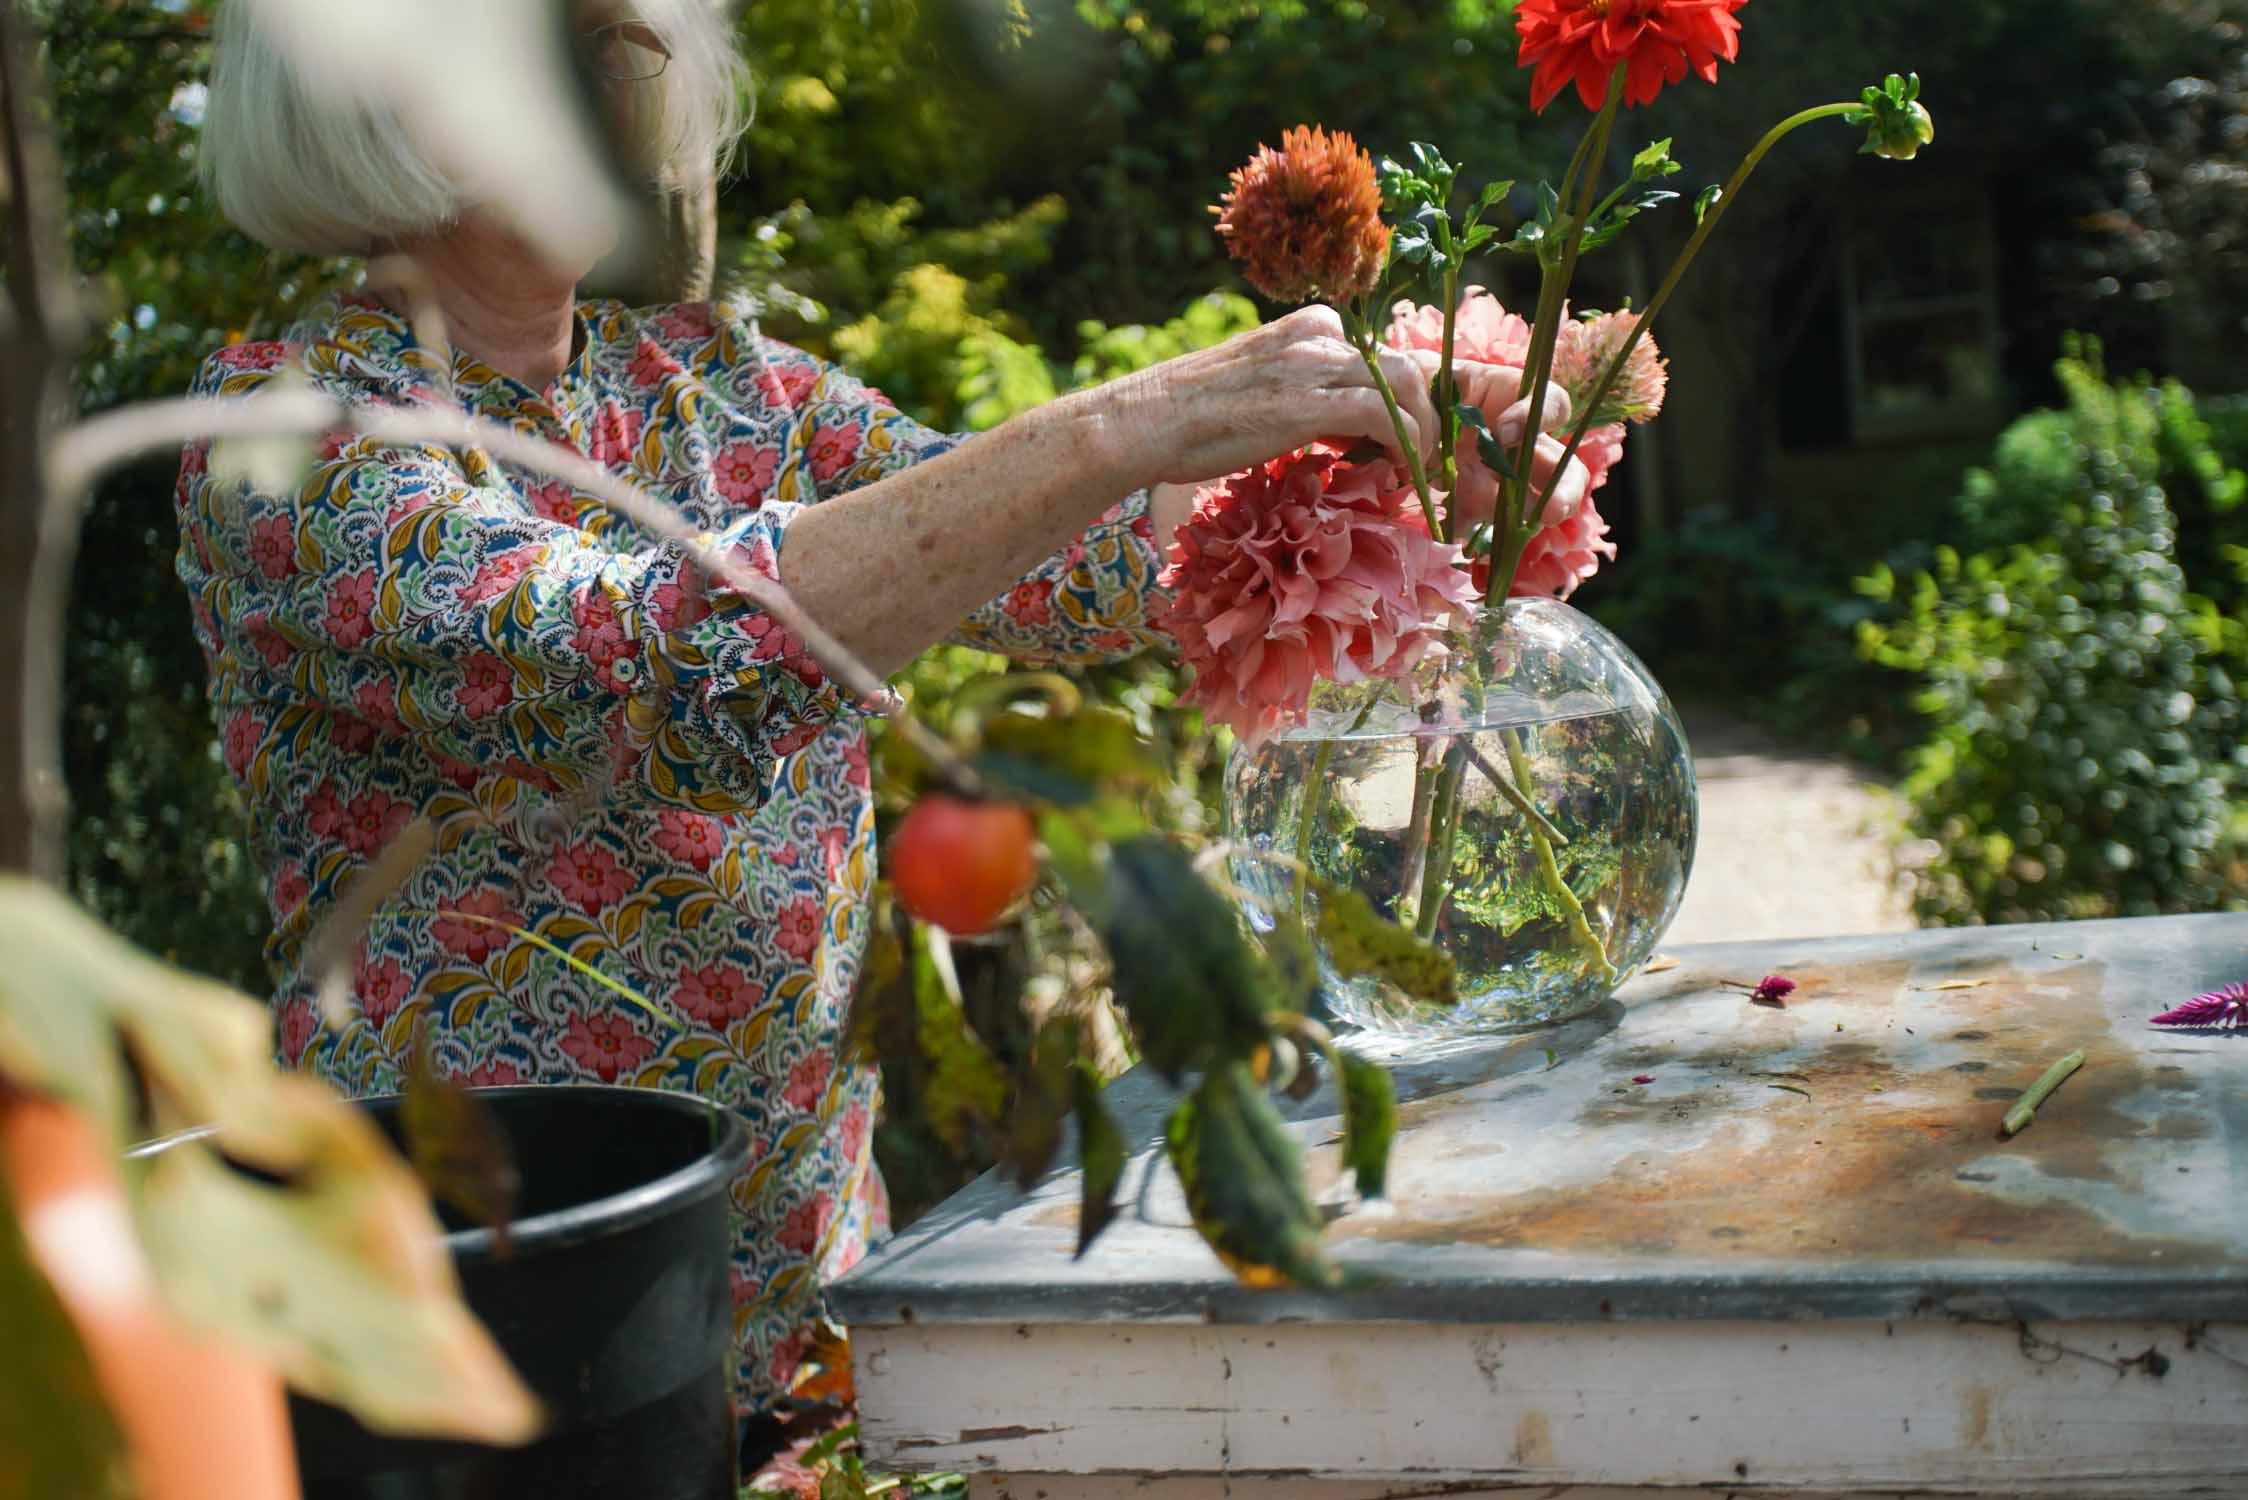 RA_3 porch farm 2016 flower social-2016101709086.jpg